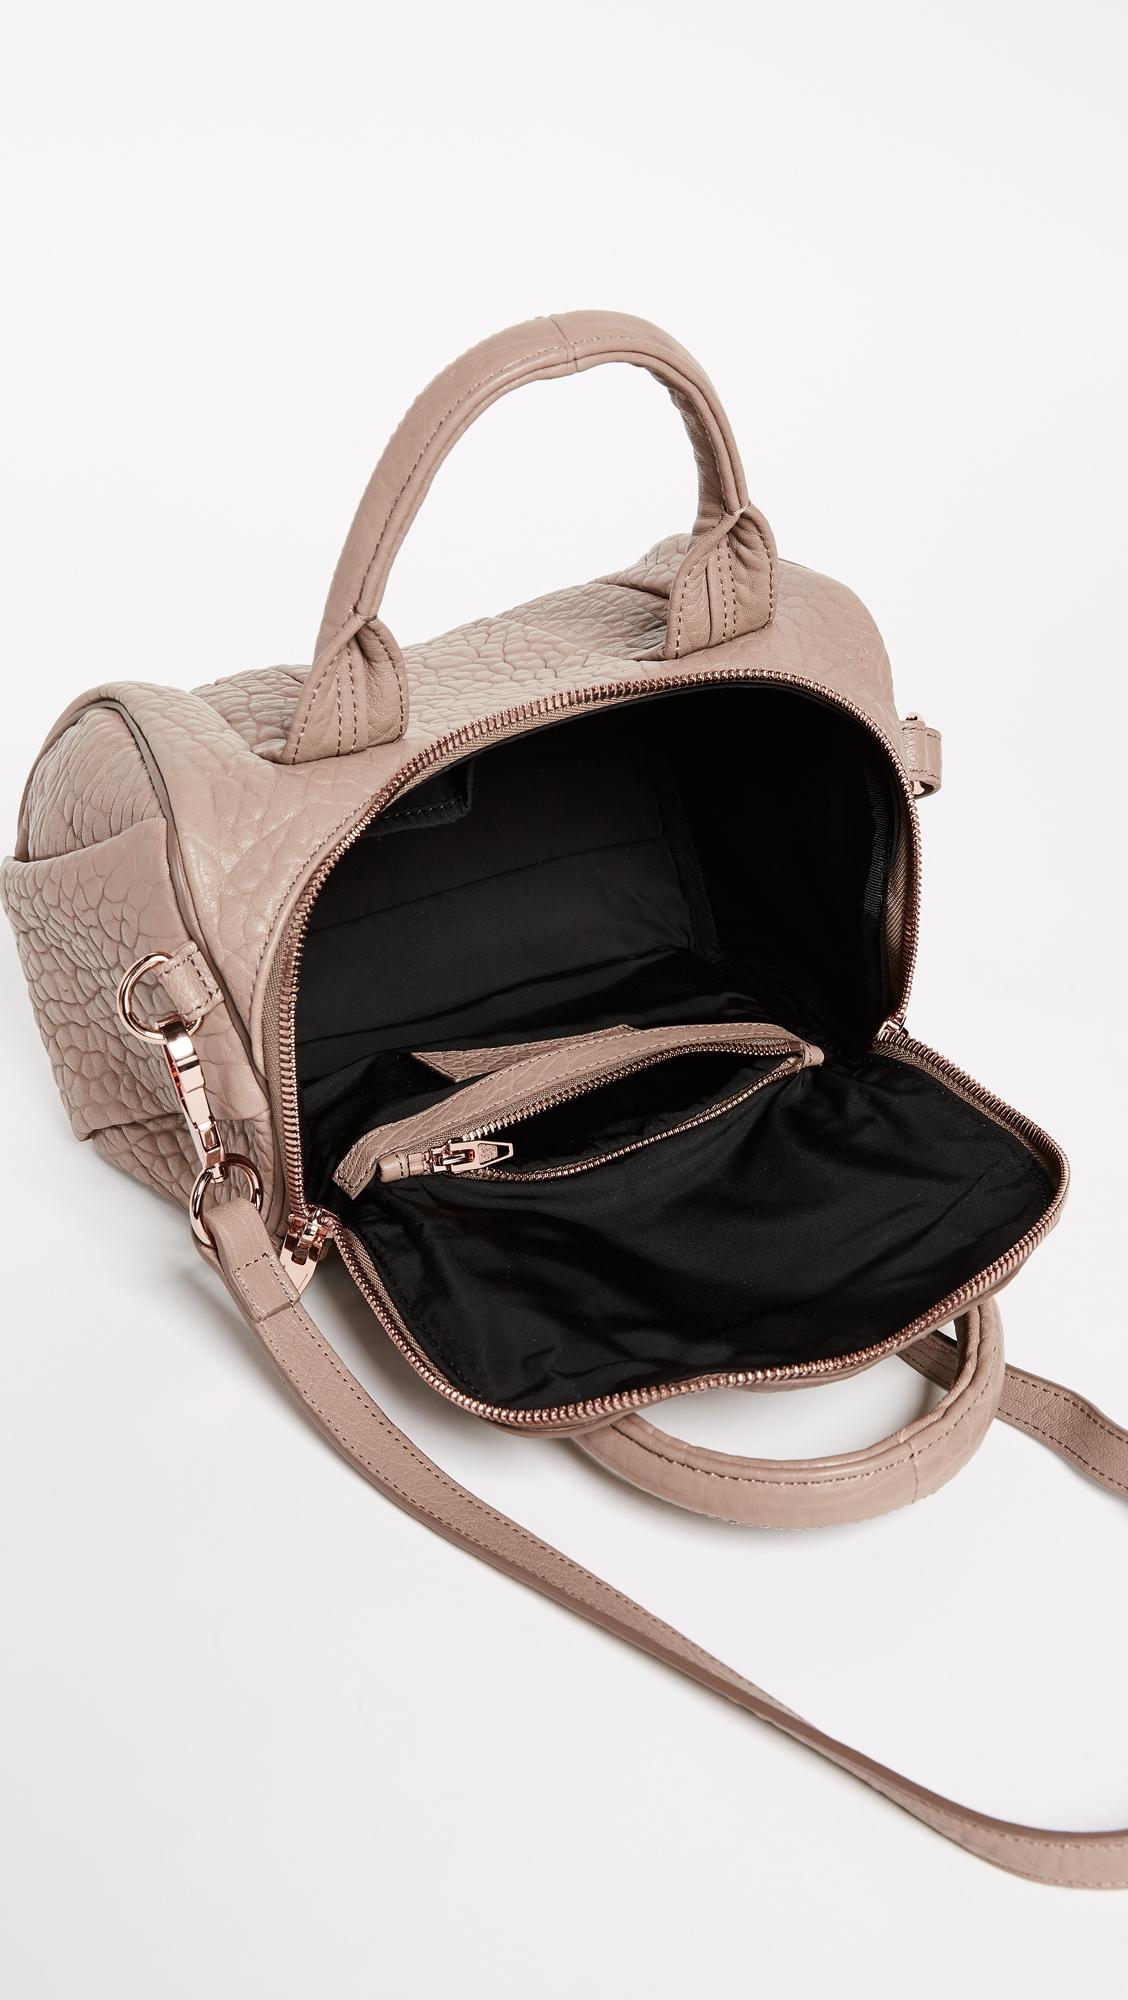 Объемная сумка Rockie Alexander Wang  (AWANG4202913783314)